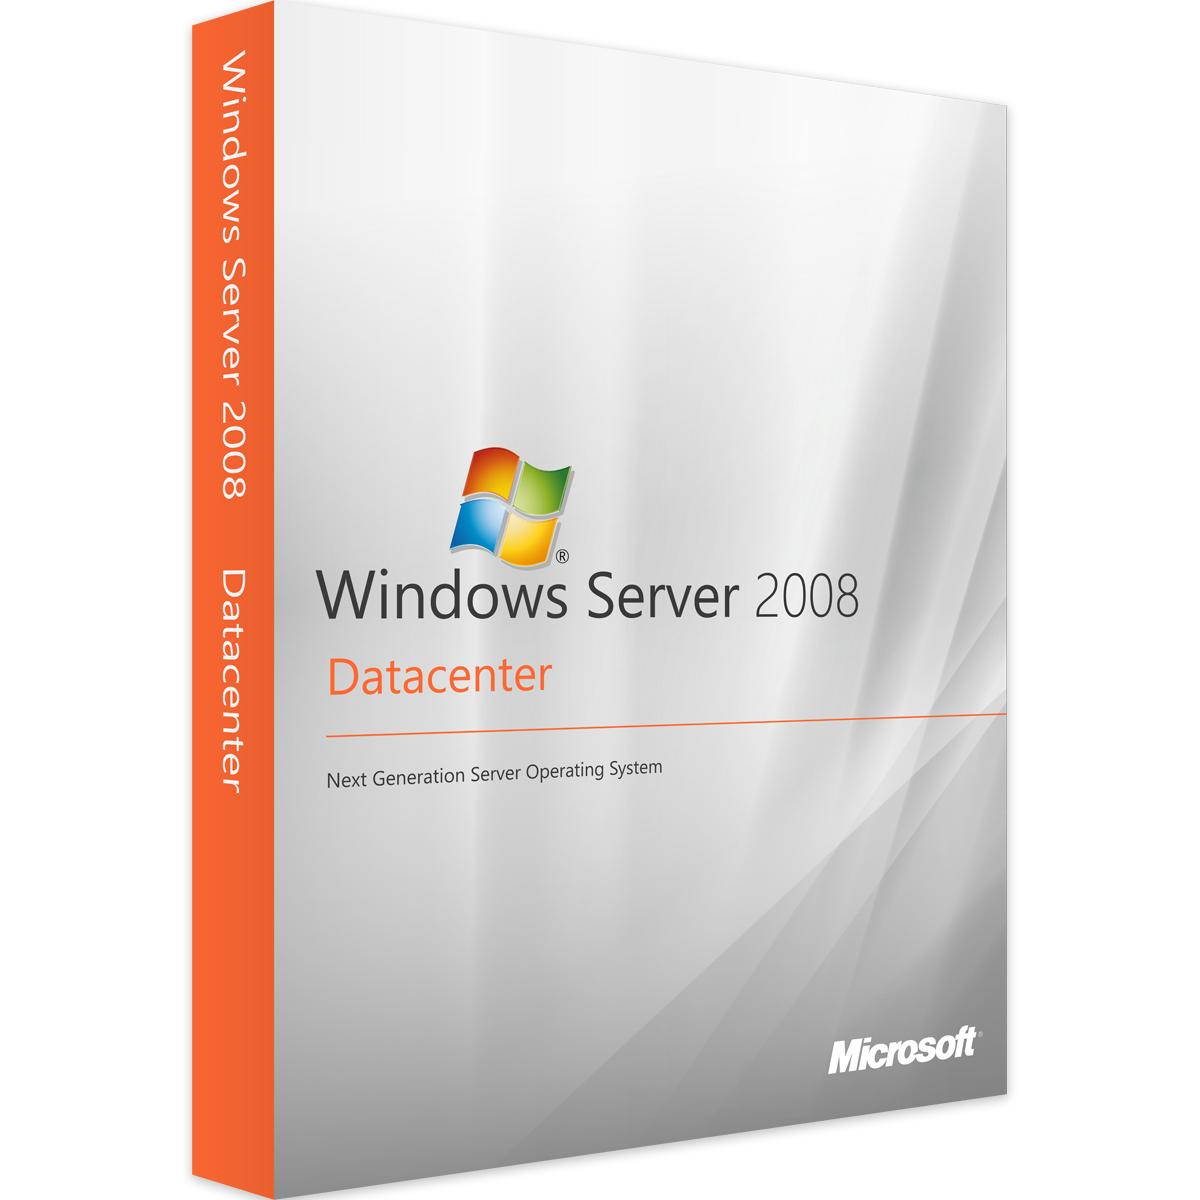 Windows Server 2008 R2 Datacenter